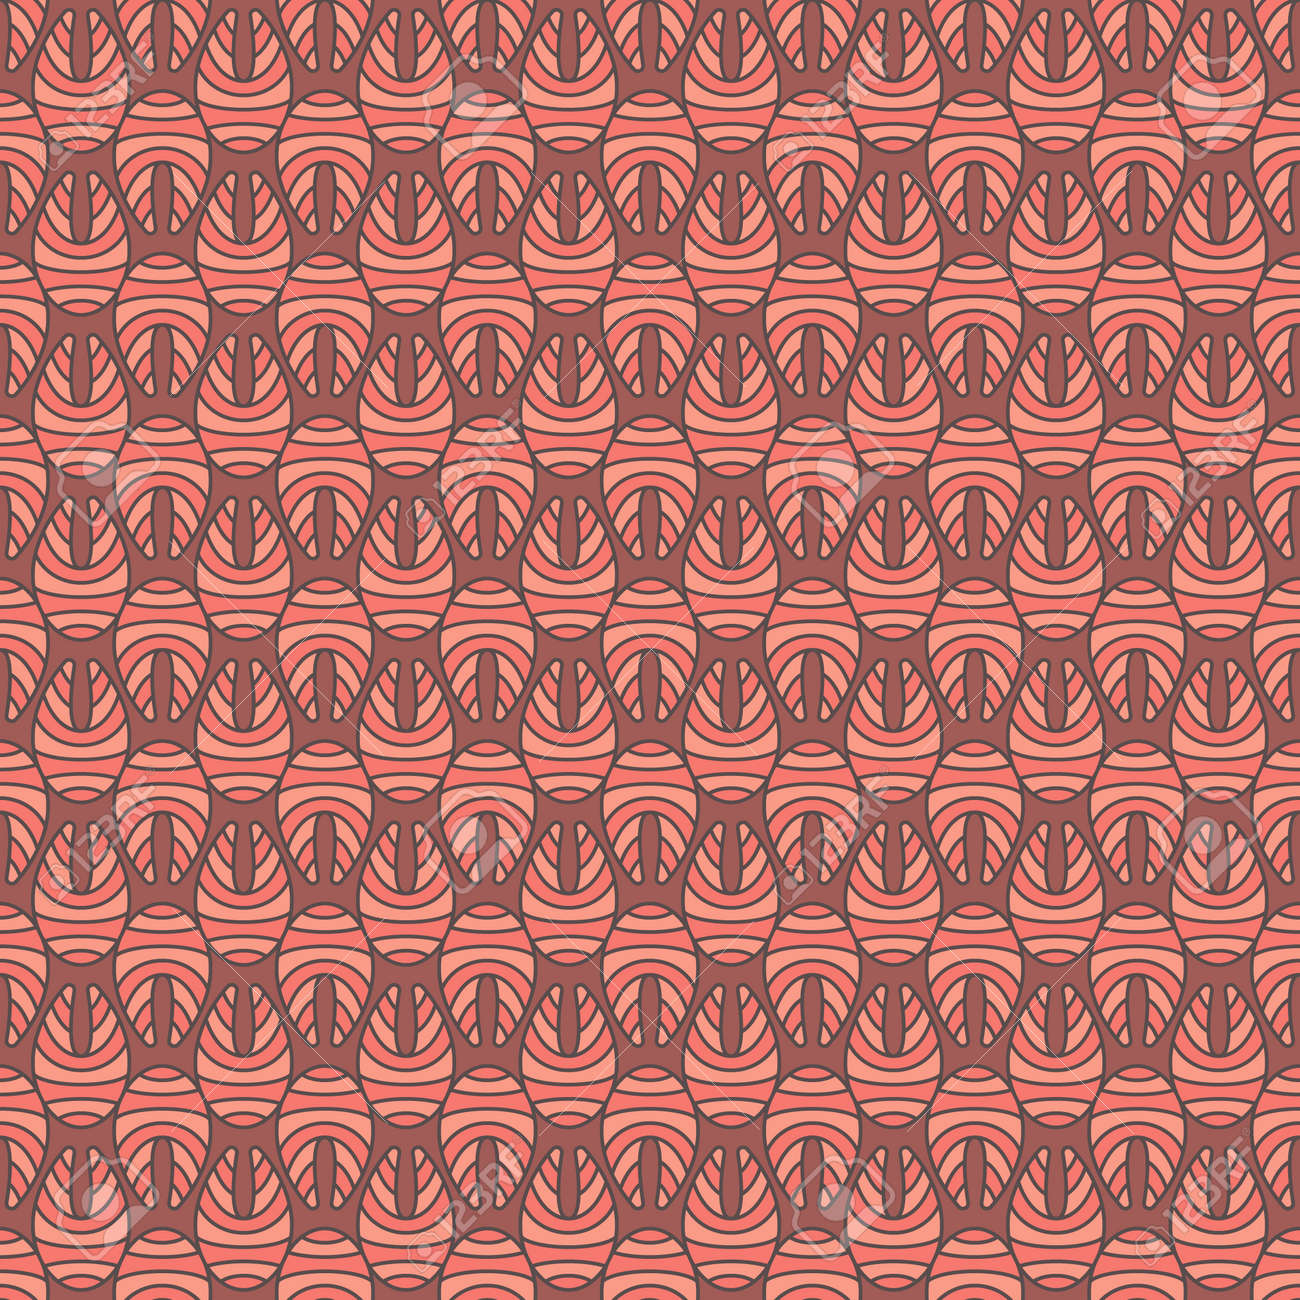 Creative Salmon Fish Steak Vector Colored Seamless Pattern Royalty ...